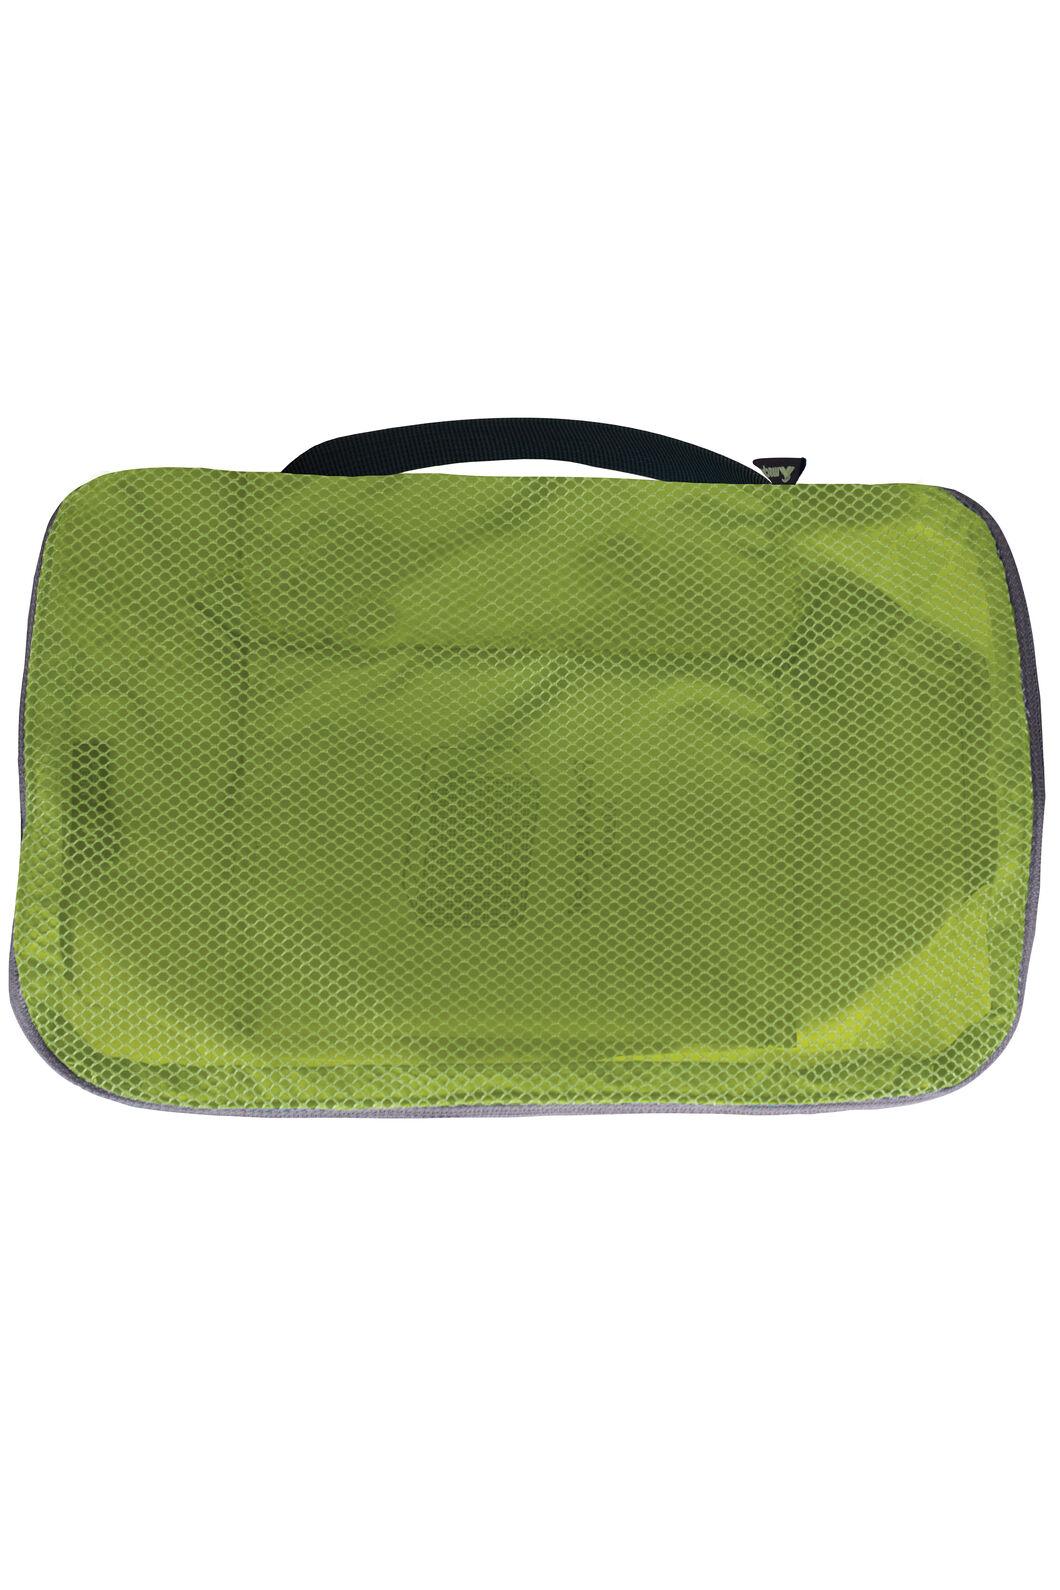 Macpac Medium Packing Cell, Apple, hi-res